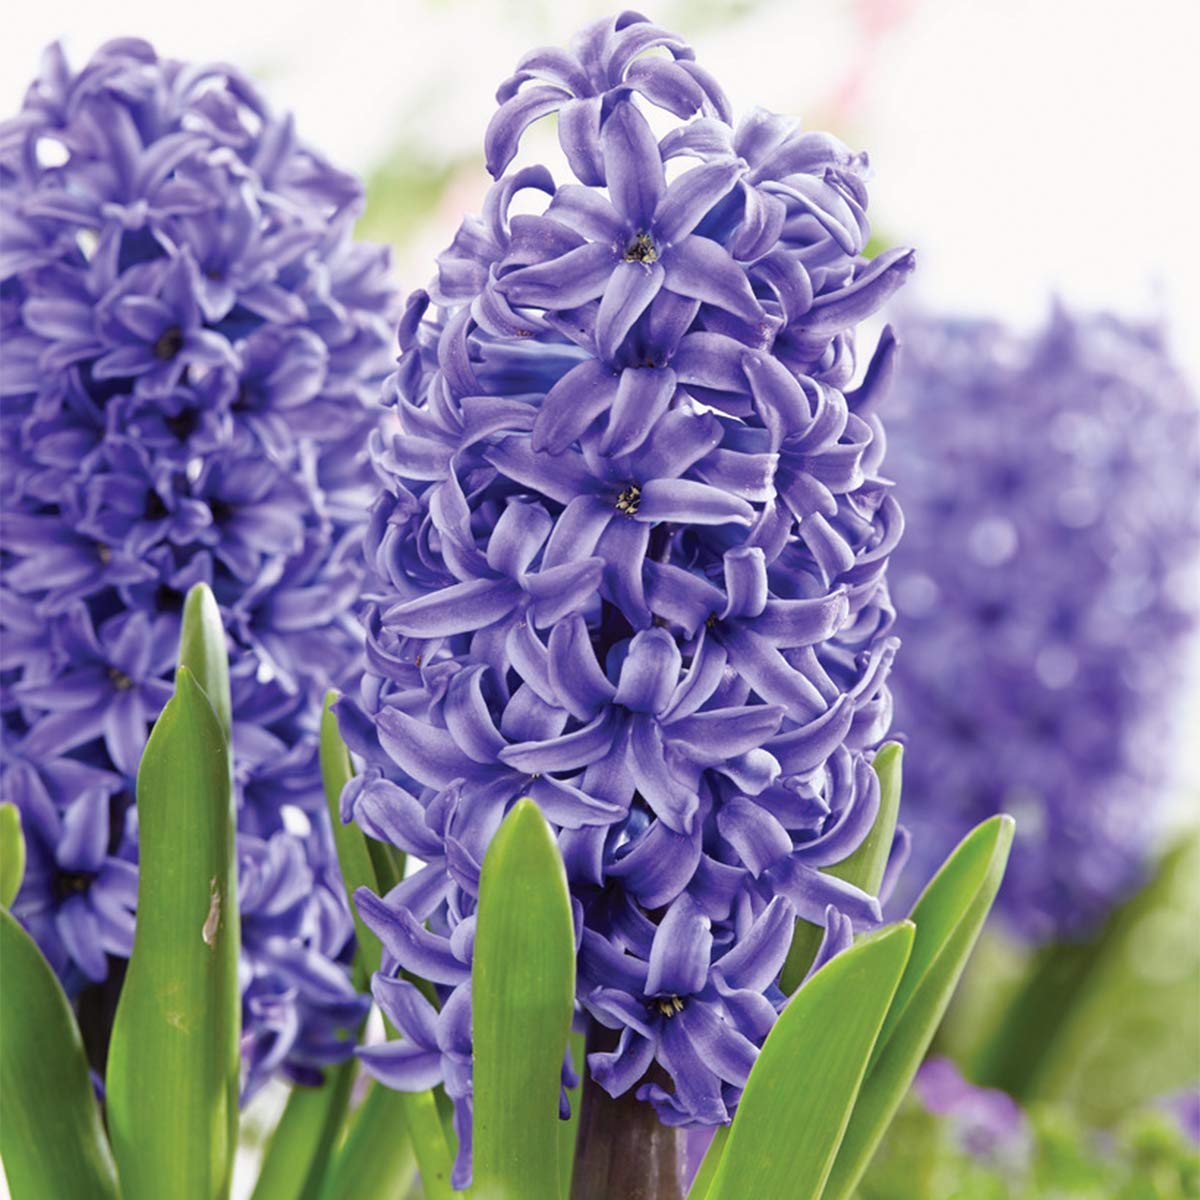 Burpee Pearl Hyacinth   5 Large Flowering Fall Bulbs for Planting, Blue by Burpee